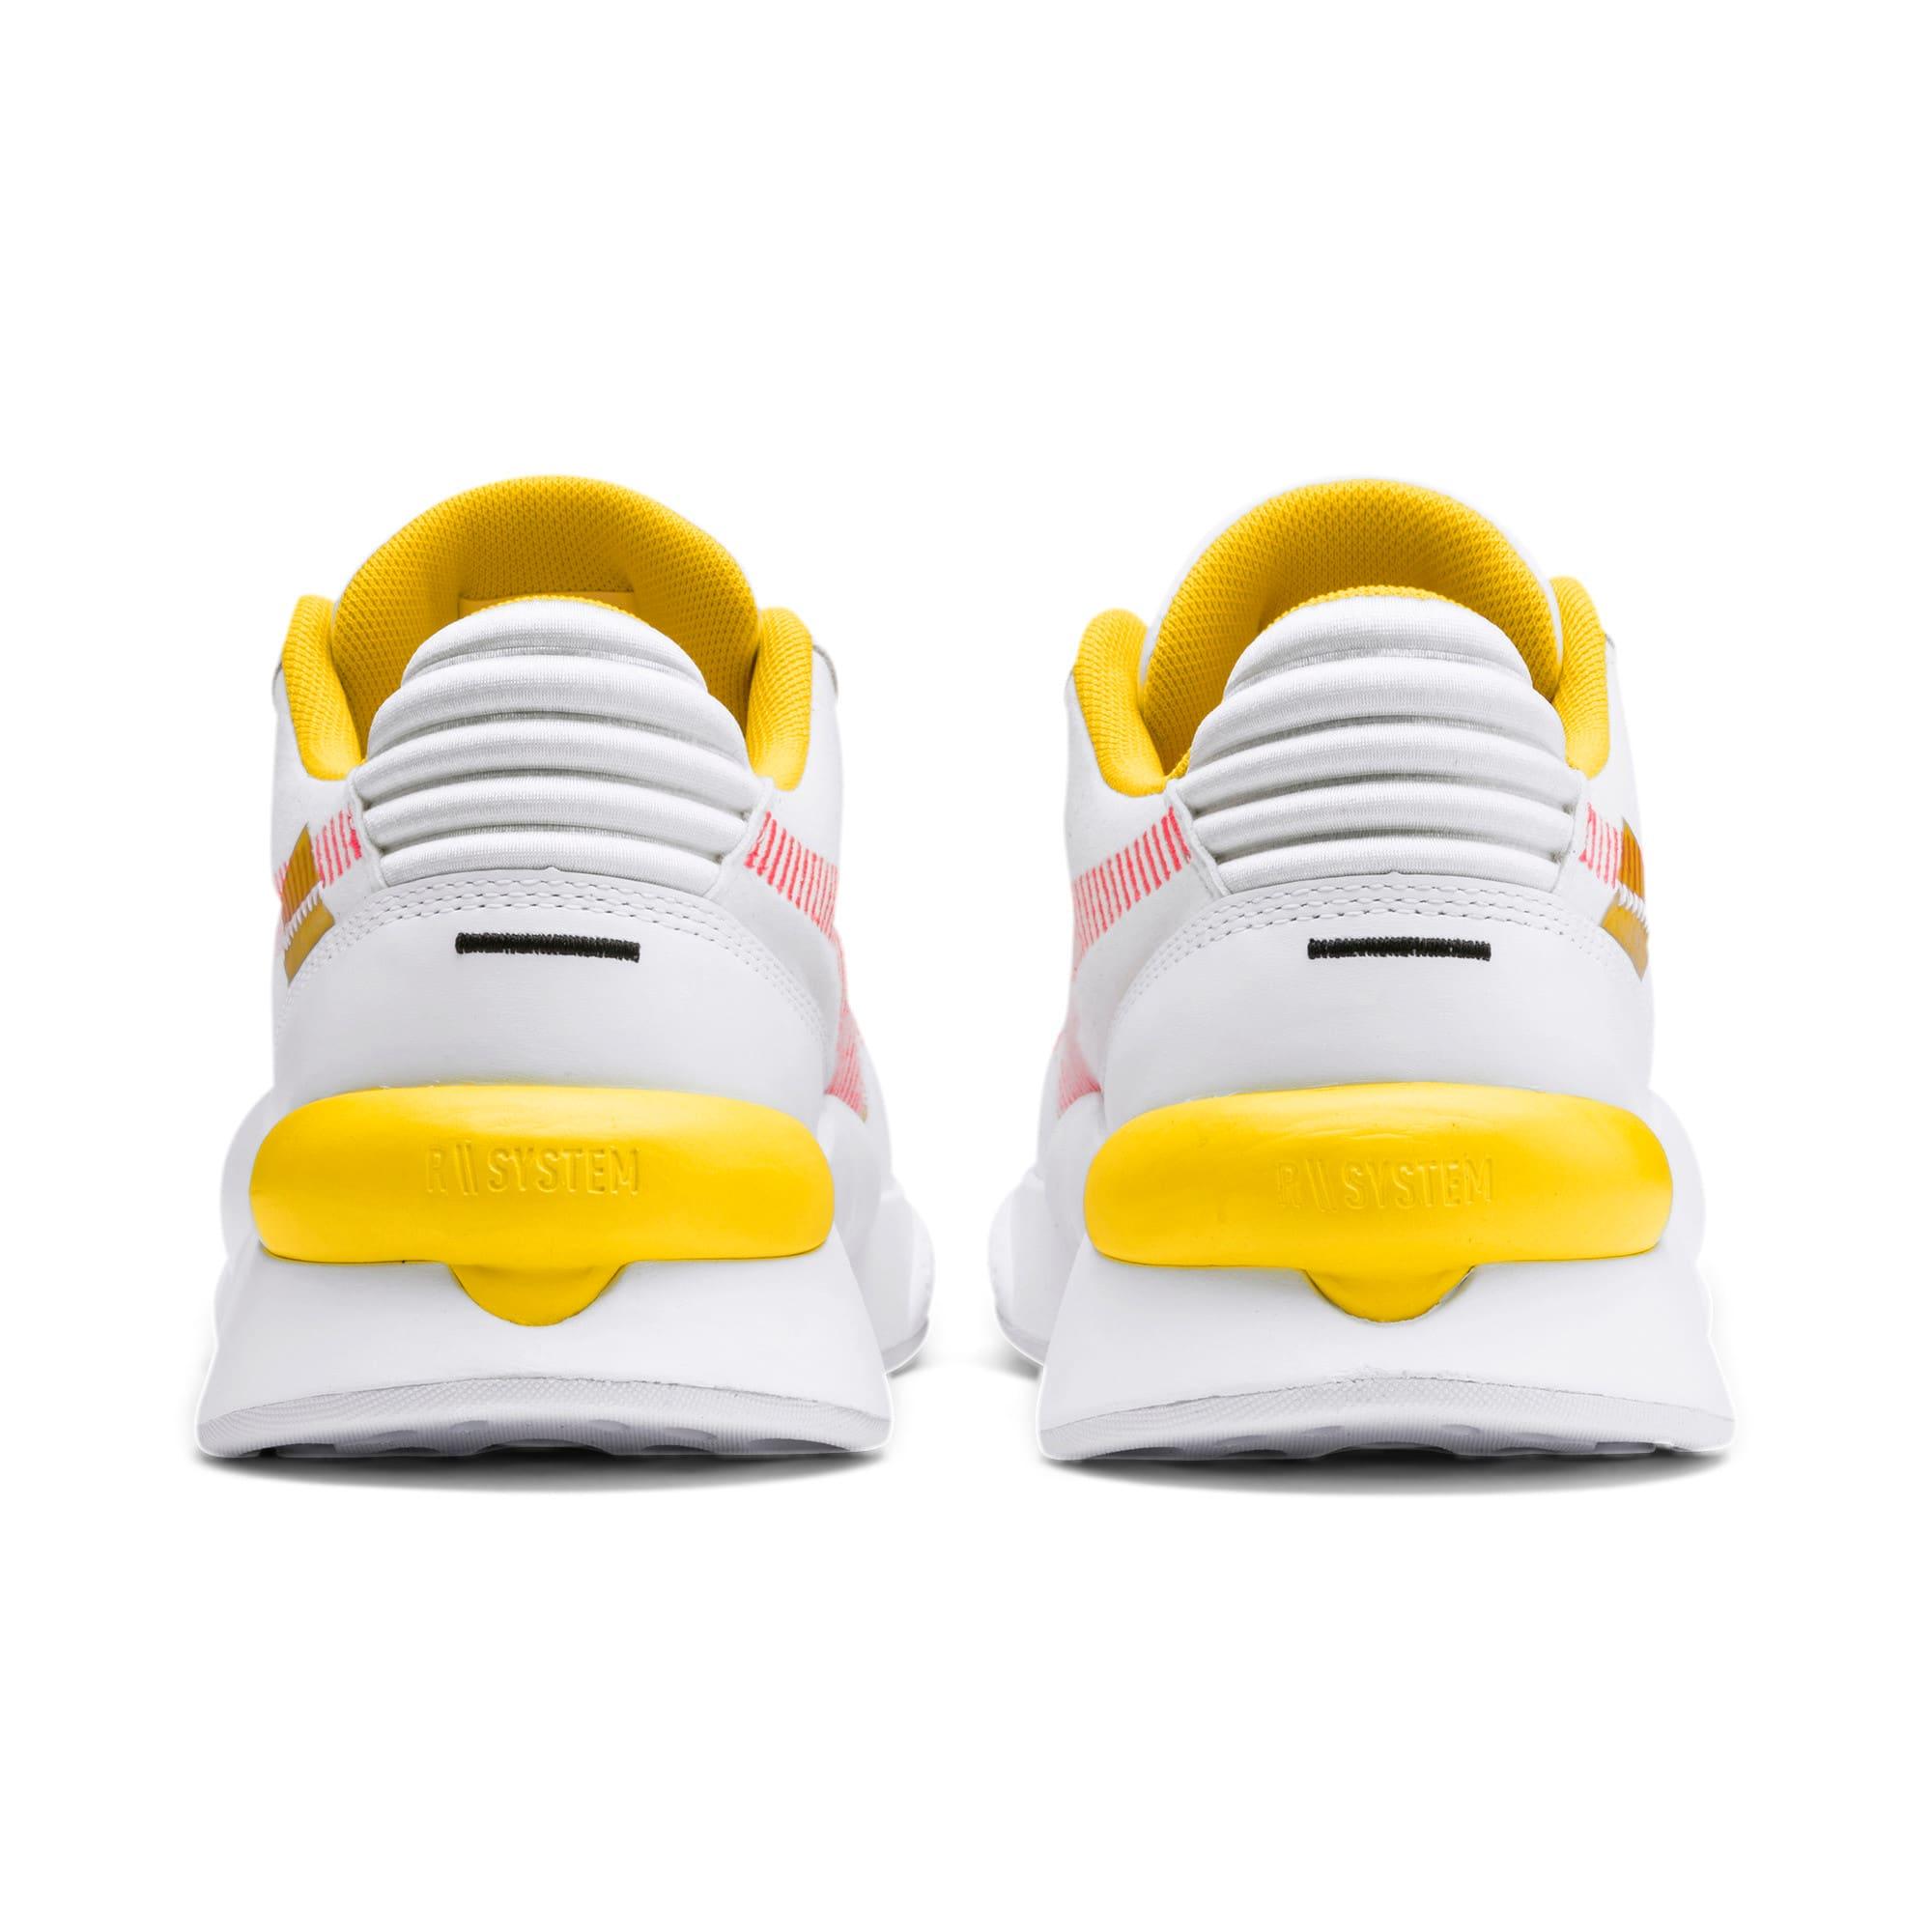 Thumbnail 4 of RS 9.8 Proto sportschoenen voor dames, Puma White, medium